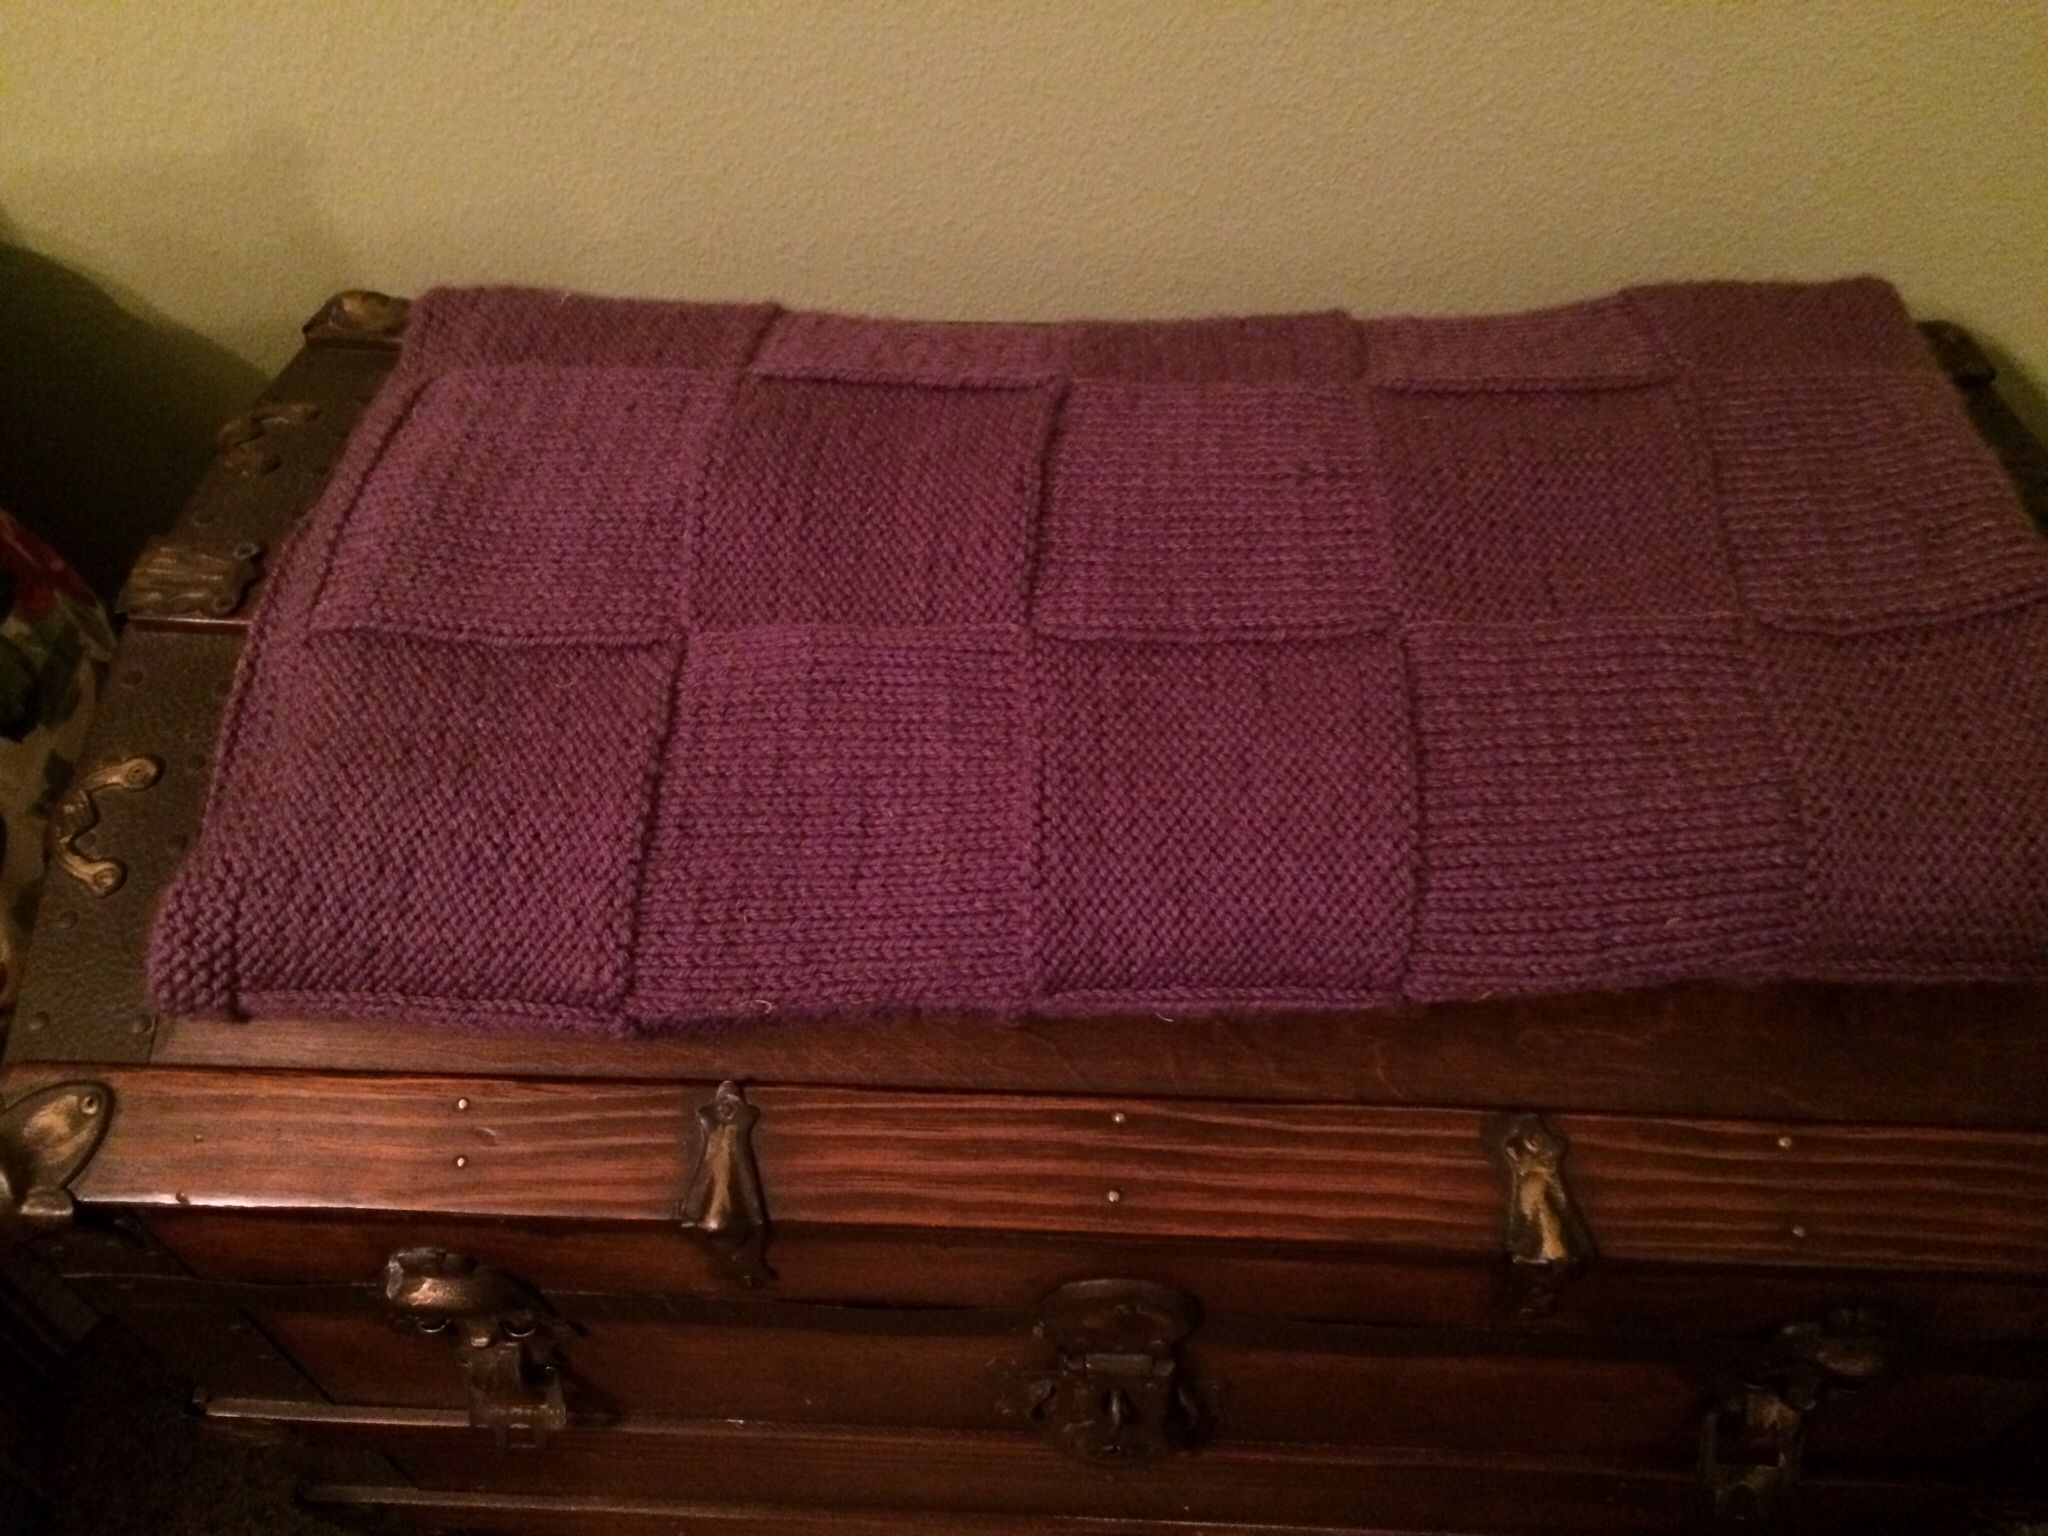 Knitting purple afghan gift to Mom.